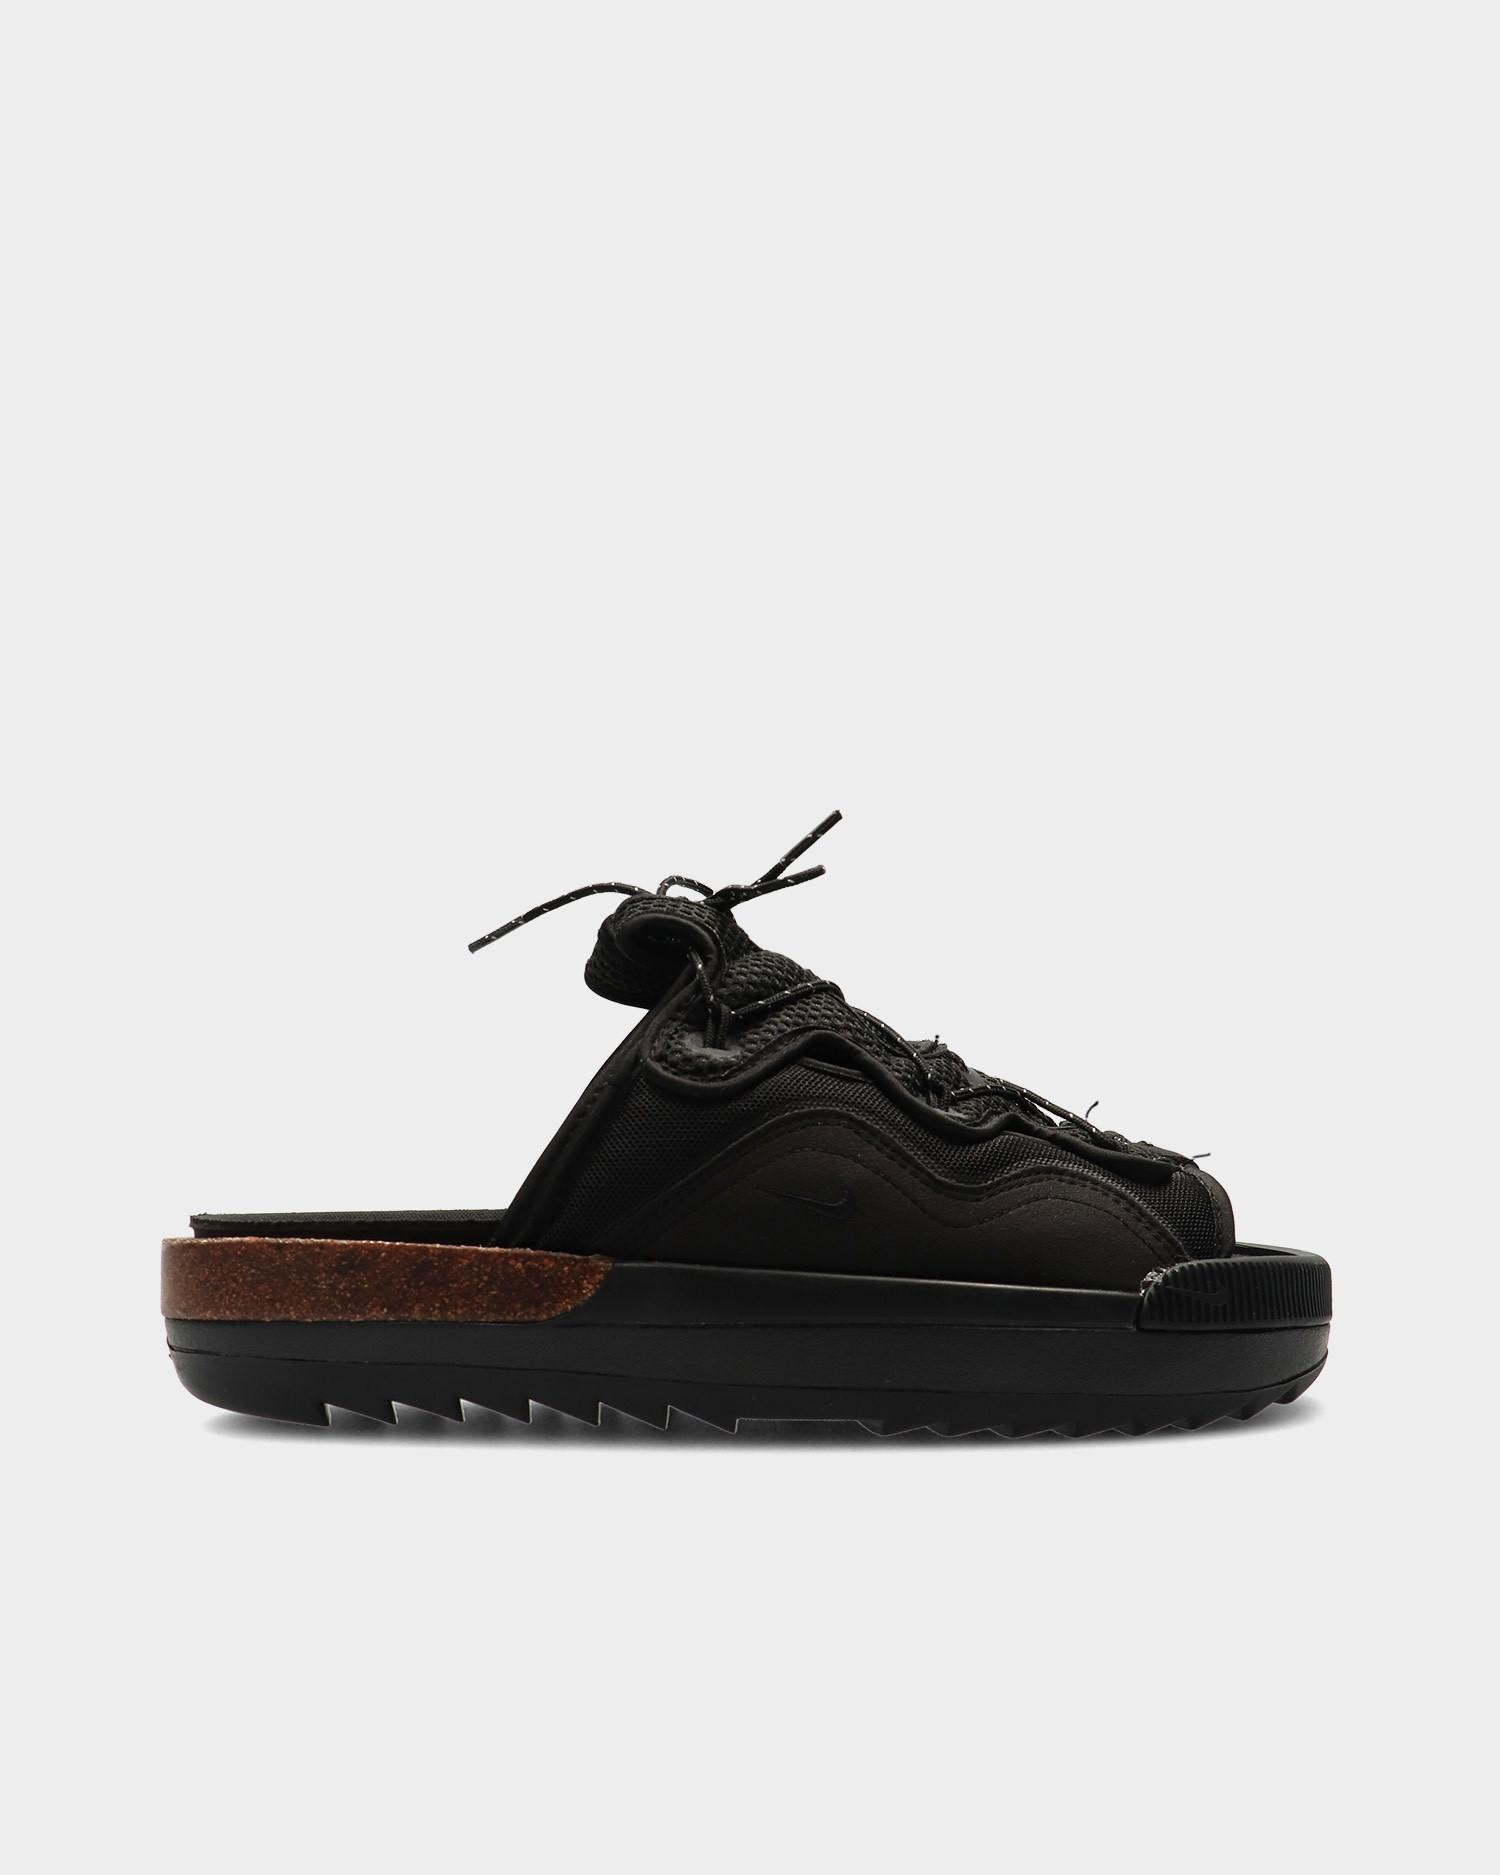 Nike offline 2.0 Black/black-black